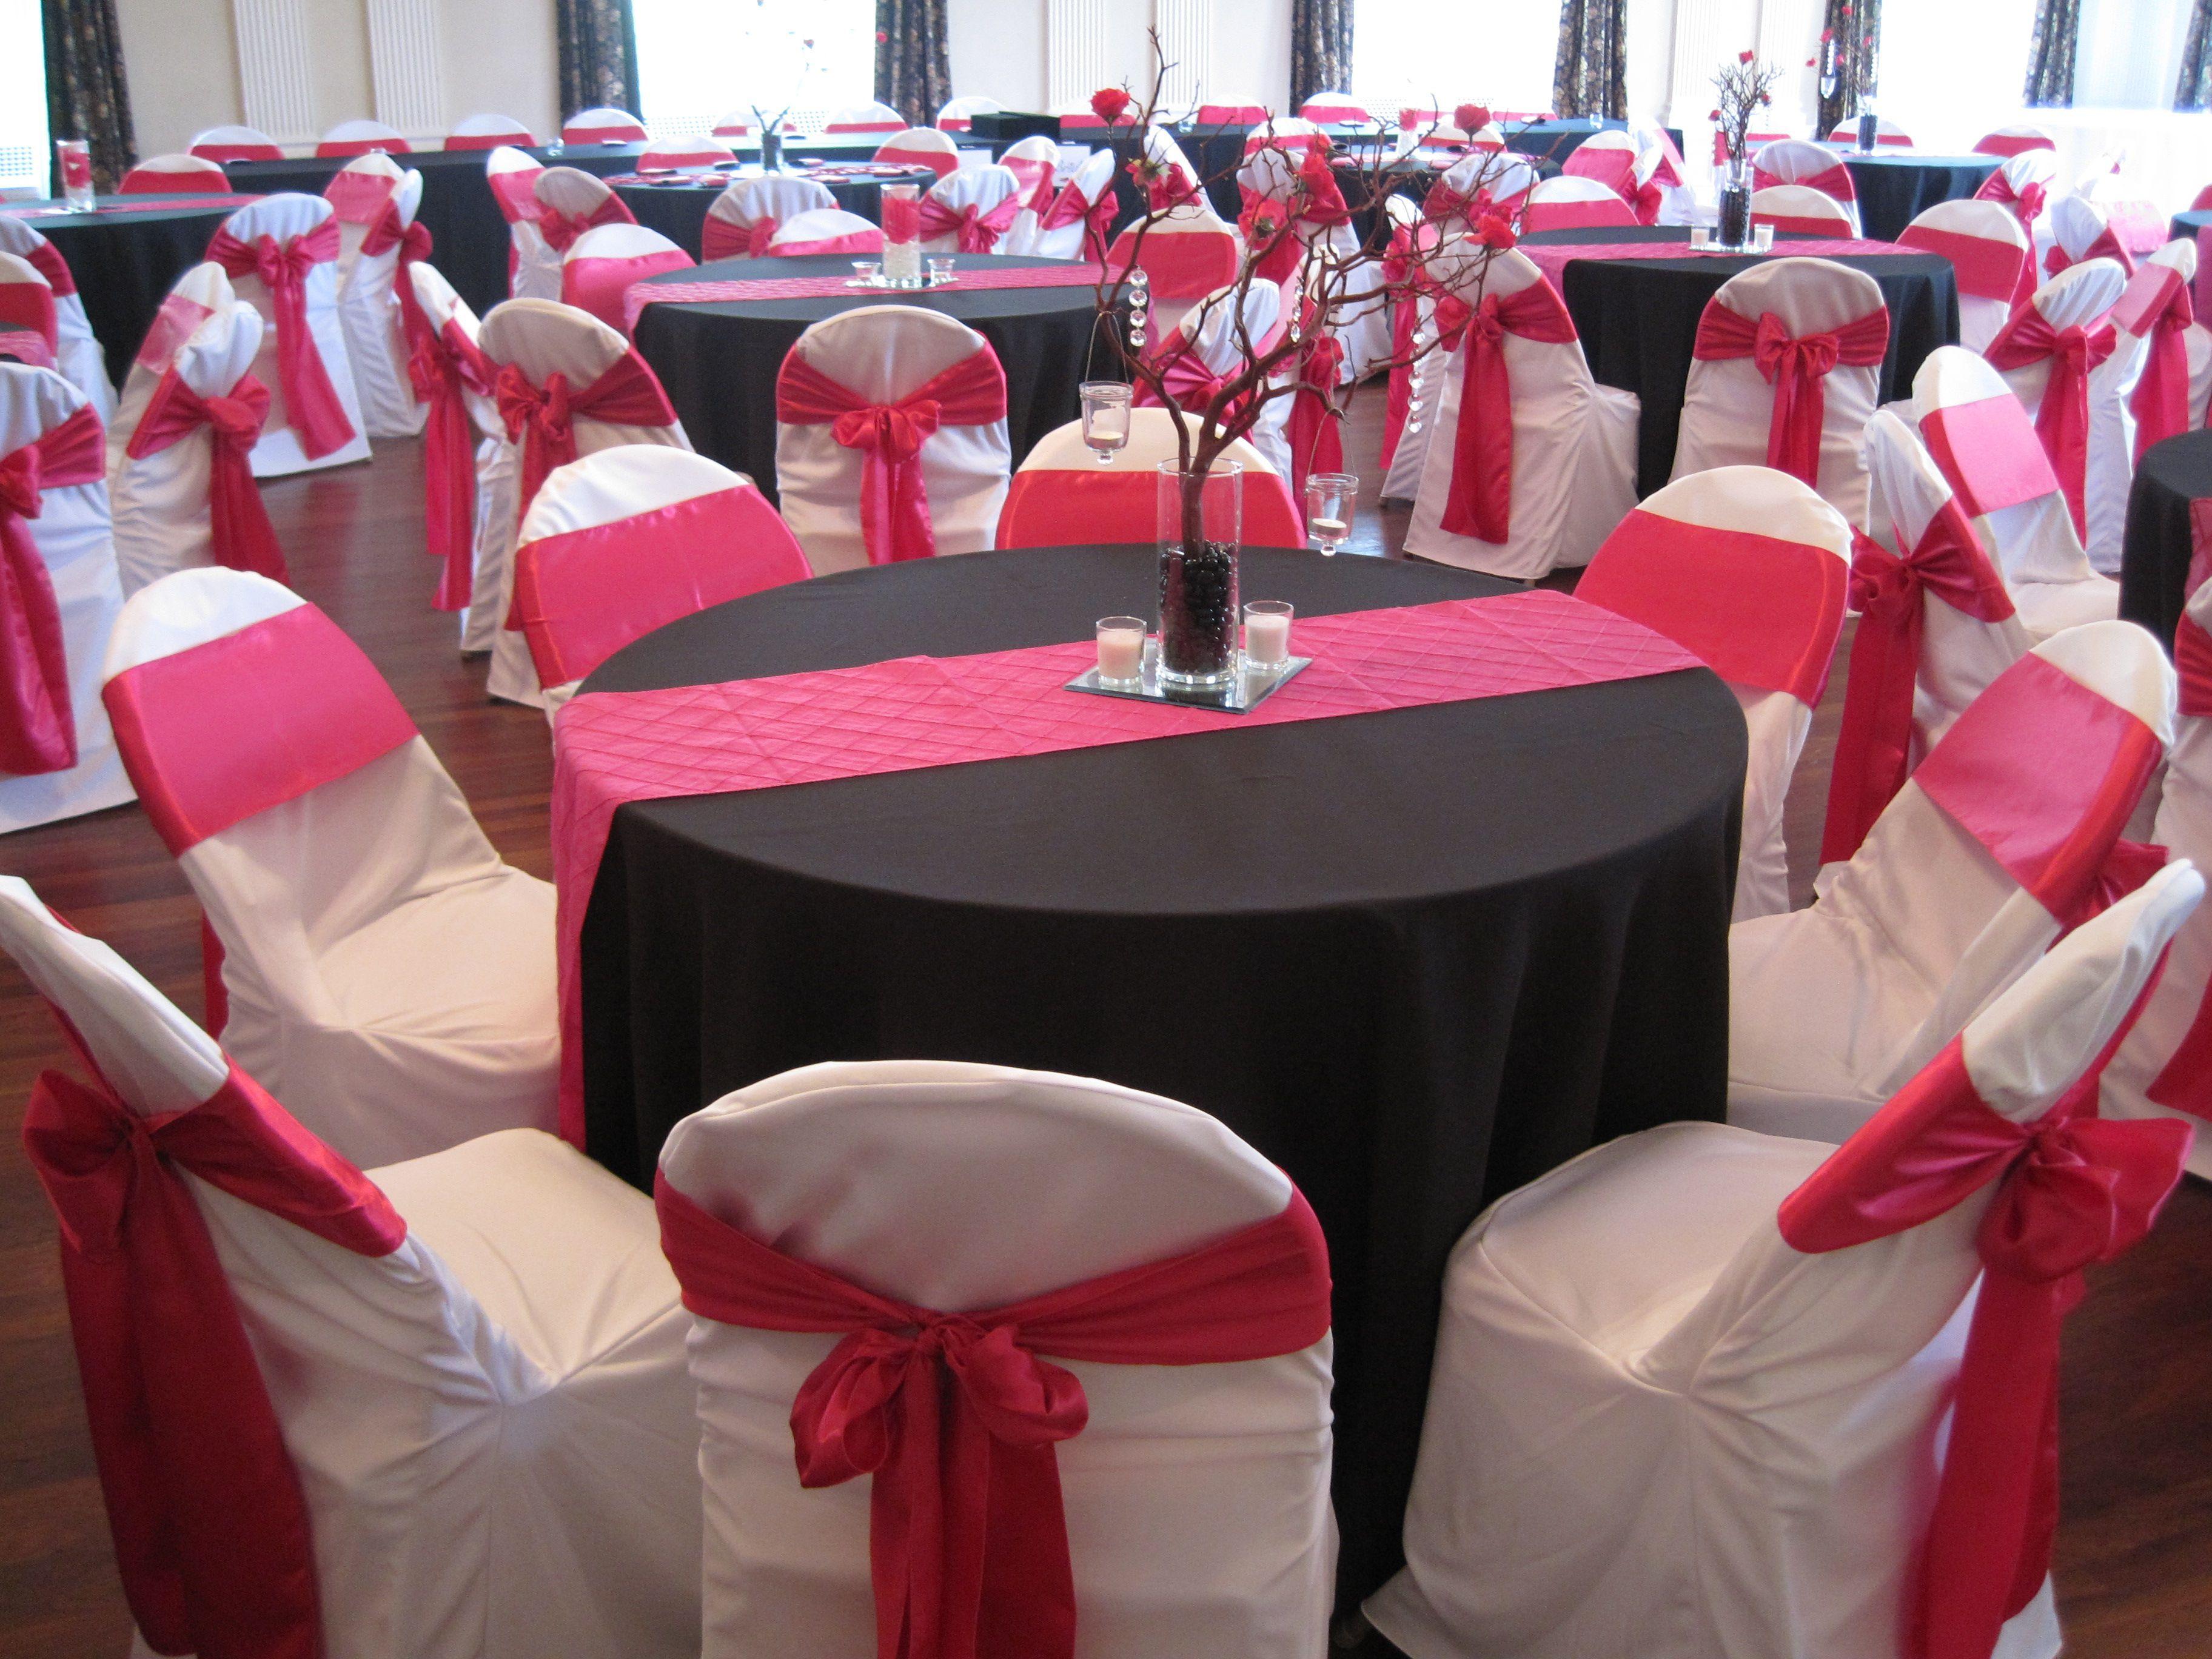 Chair Sash Satin Hot Pink Weddings Black Tablecloth Wedding